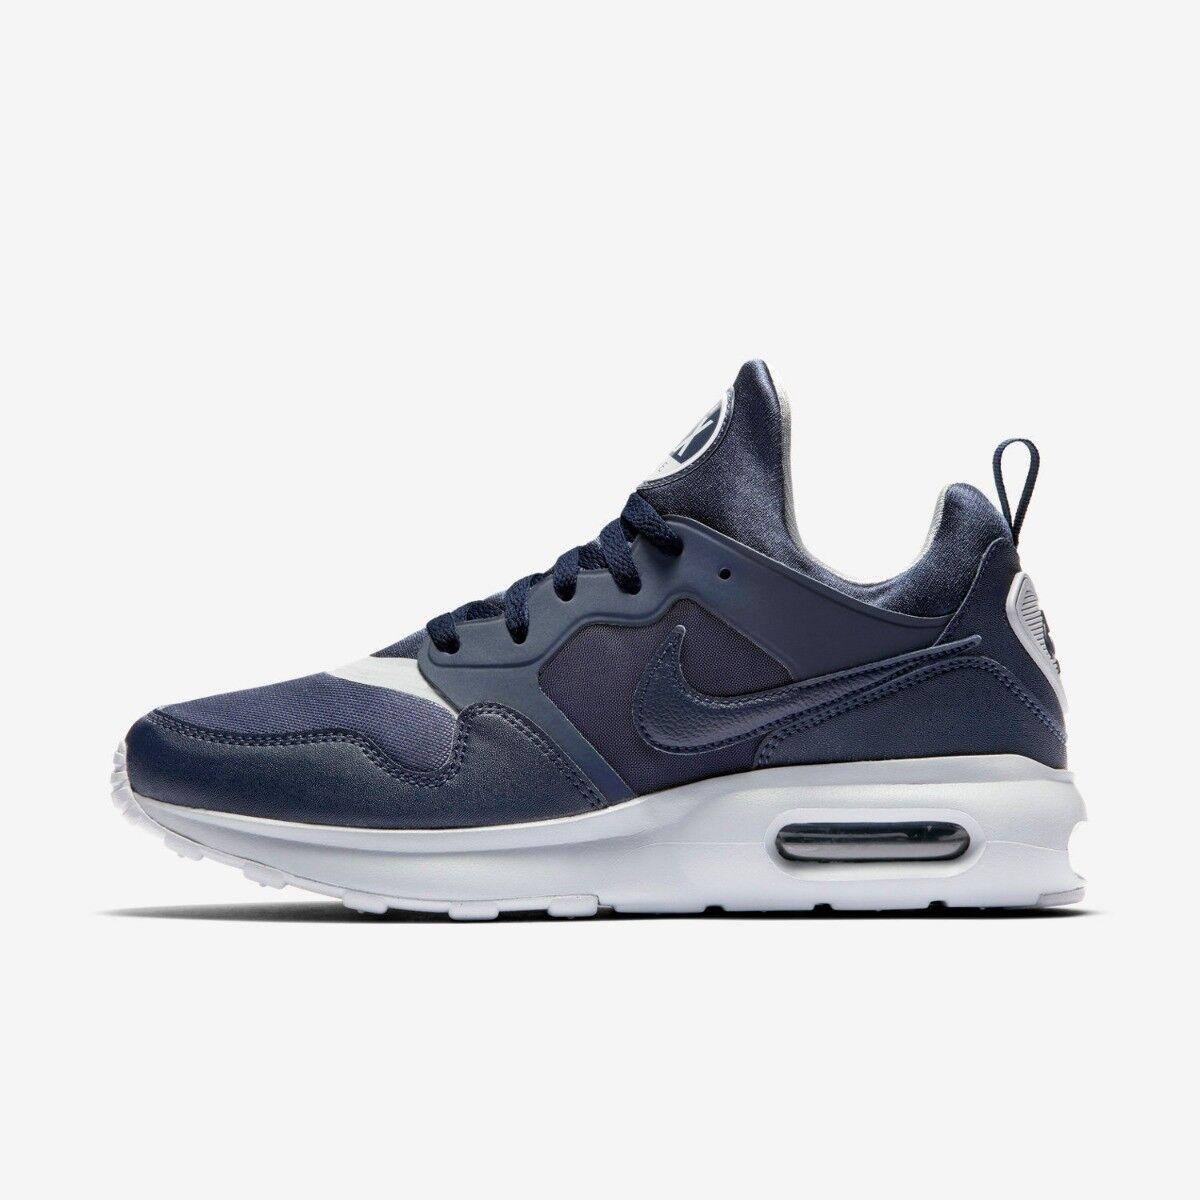 Nike AIR MAX PRIM da Uomo Hi Top Trainer Shoe SZE 6 8.5 9 10 Grigio OSSIDIANA RRP